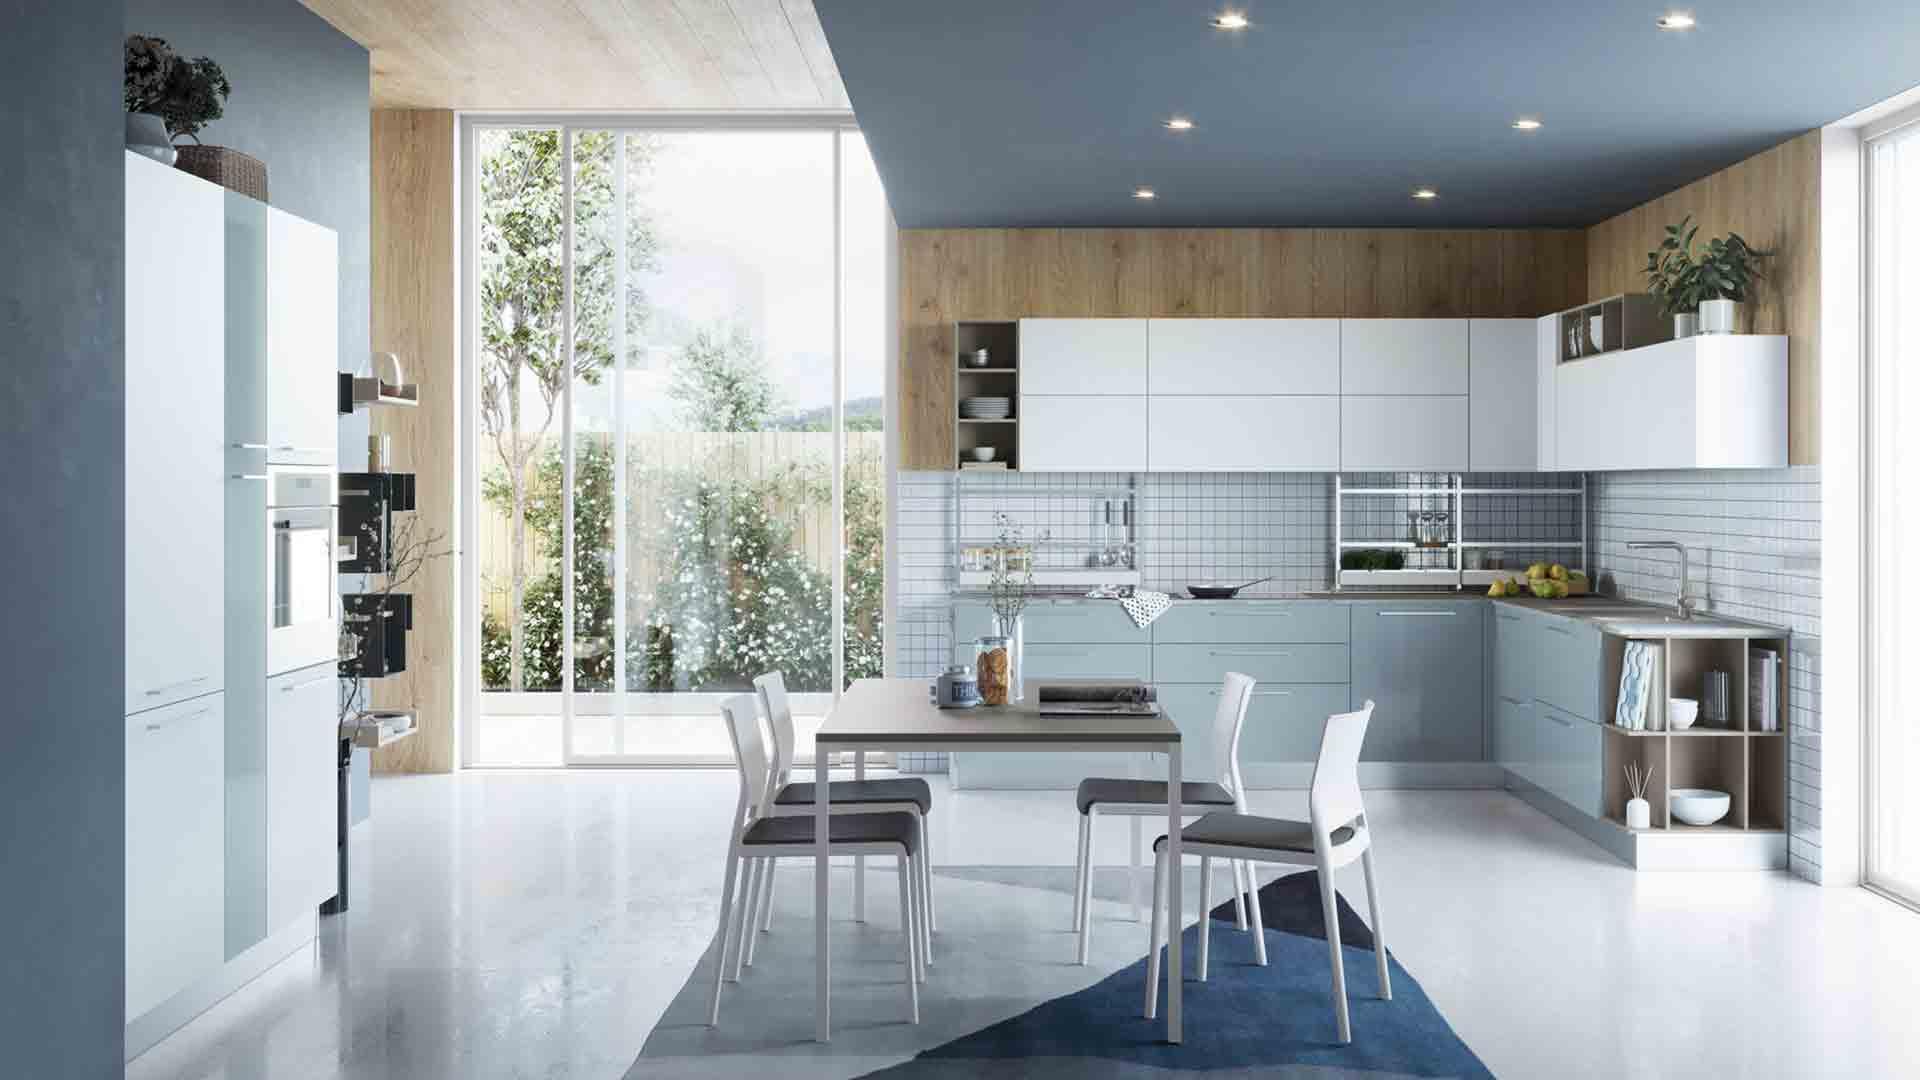 Zoe - Cucine Moderne - Creo Kitchens